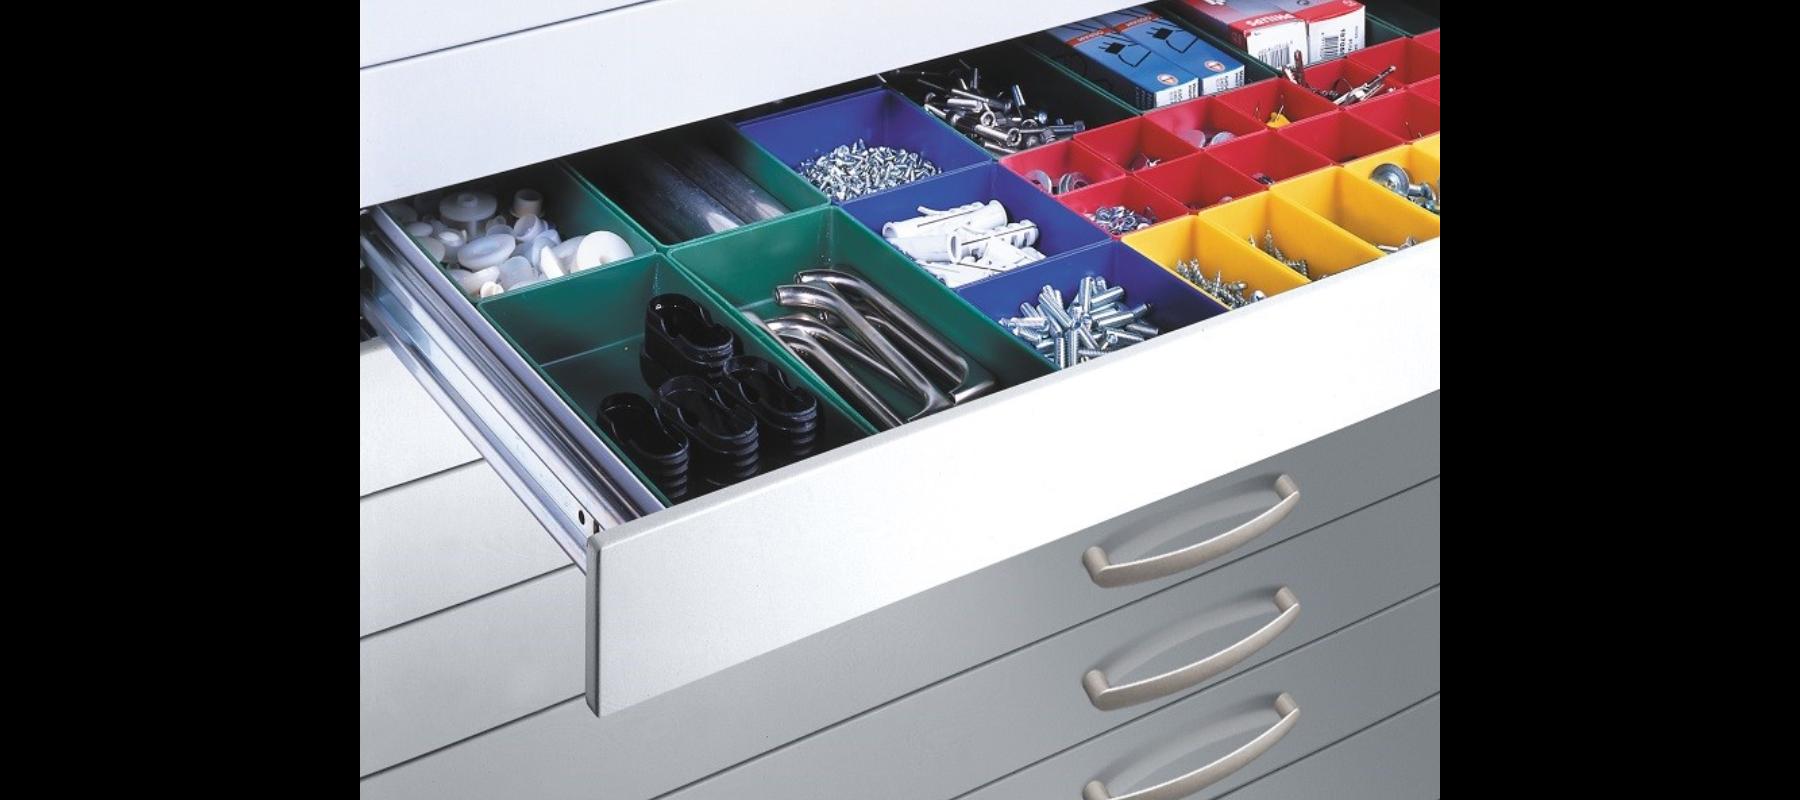 metalowe meble biurowe szafy szufladowe cp detale - 09